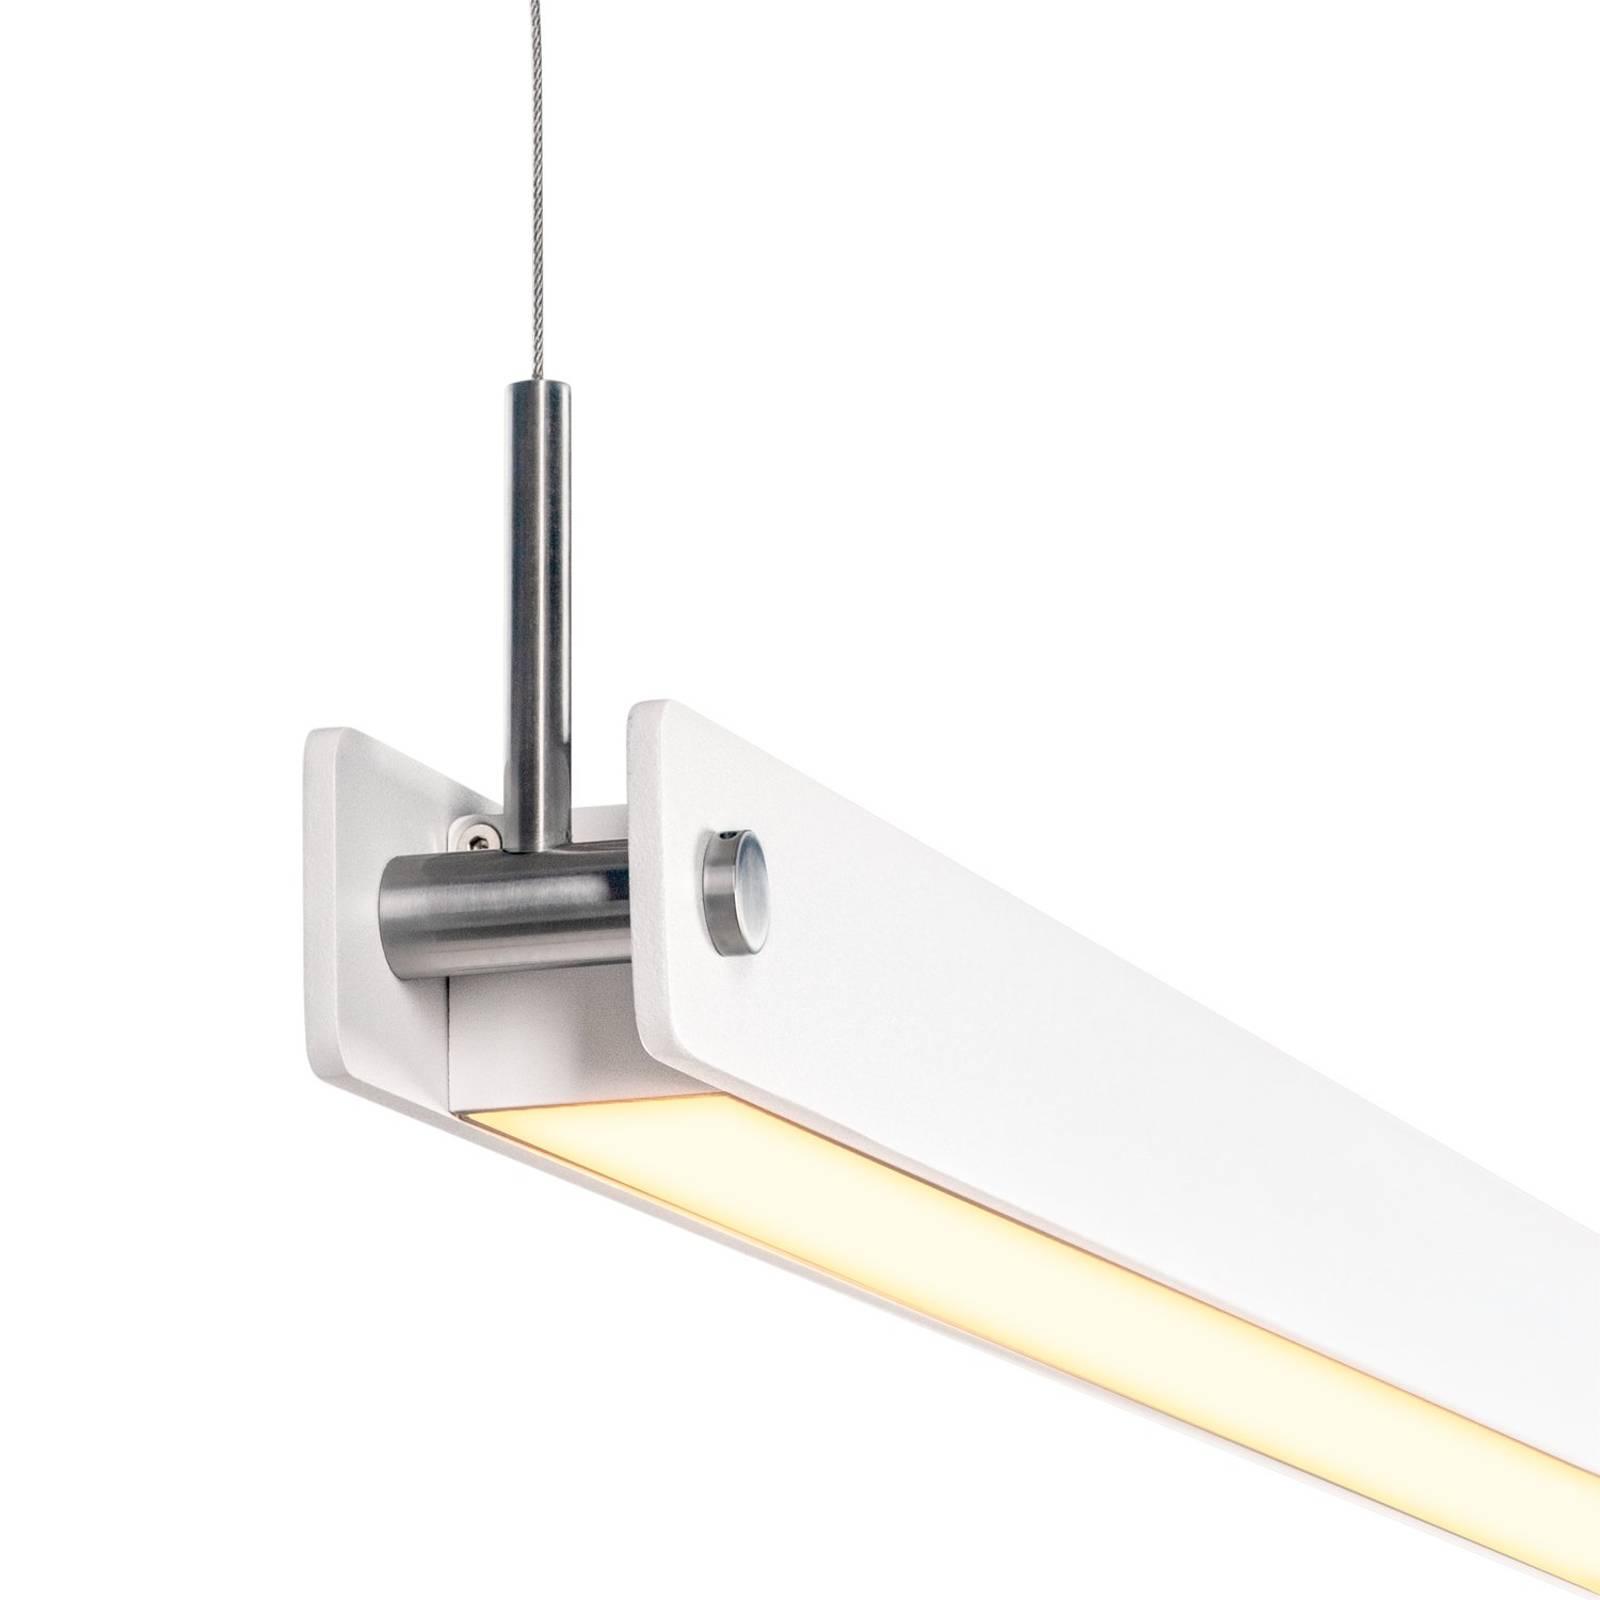 SLV Noya PD -LED-riippuvalaisin valkoinen